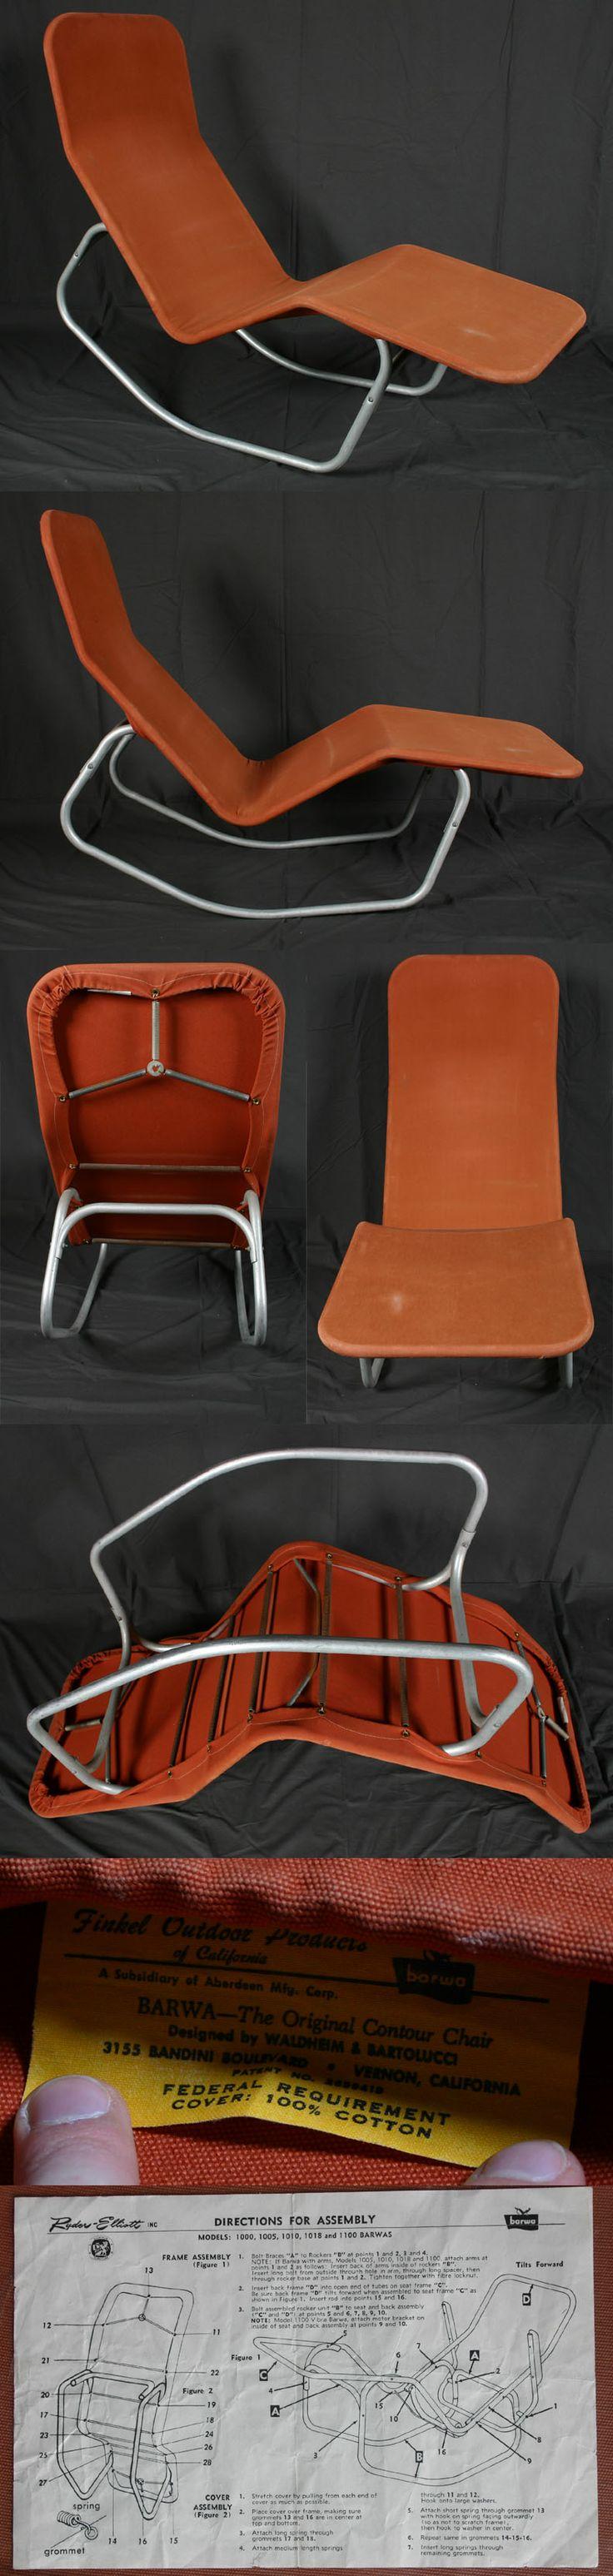 Vintage Barwa Lounge/Contour Chair+instructions | Antique Helper